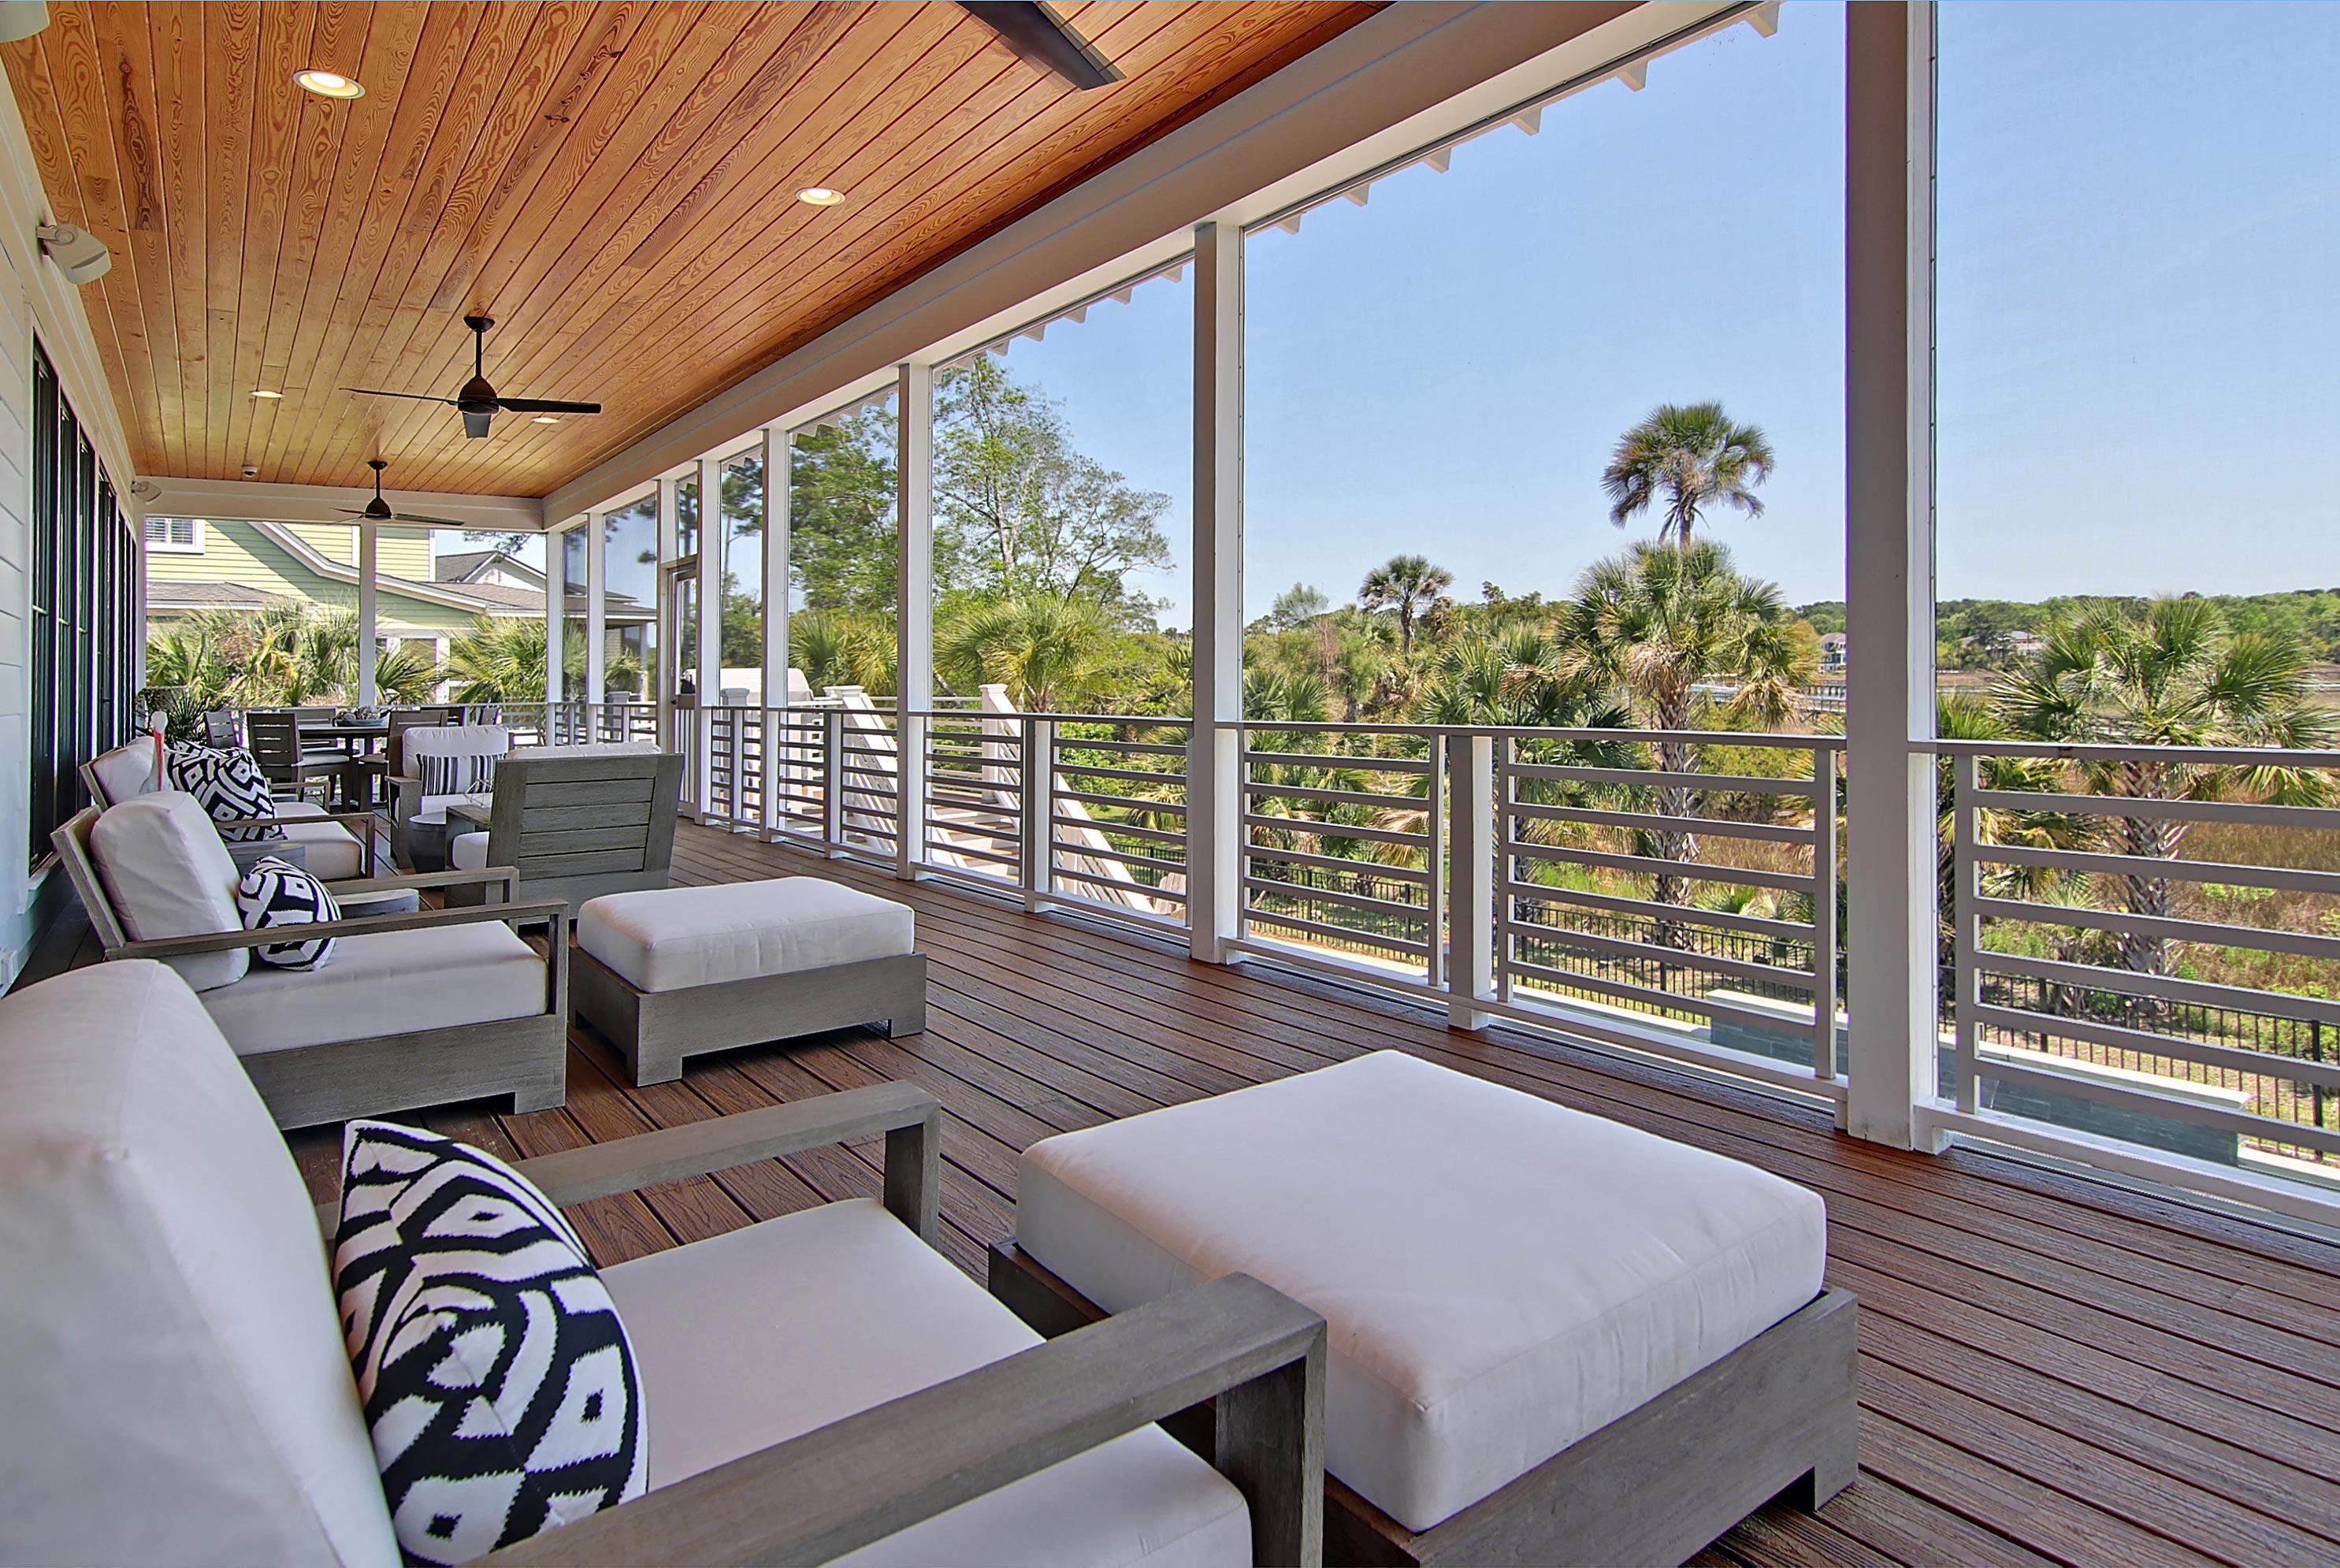 Dunes West Homes For Sale - 2456 Darts Cove, Mount Pleasant, SC - 38